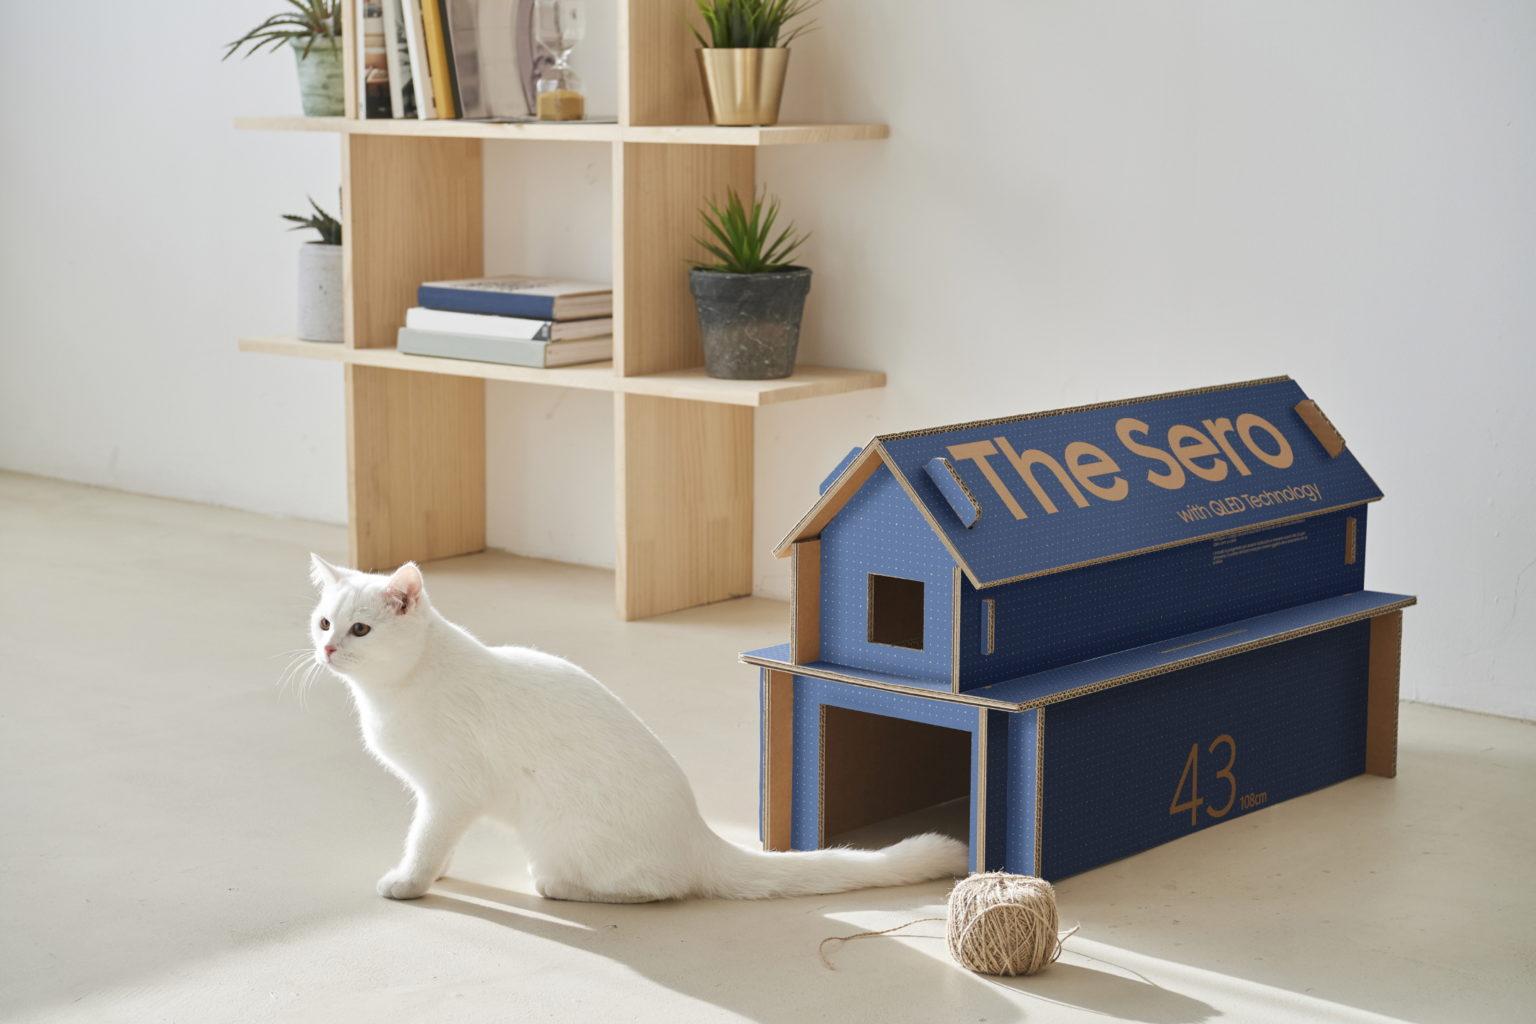 Samsung-TV-box-cat-house